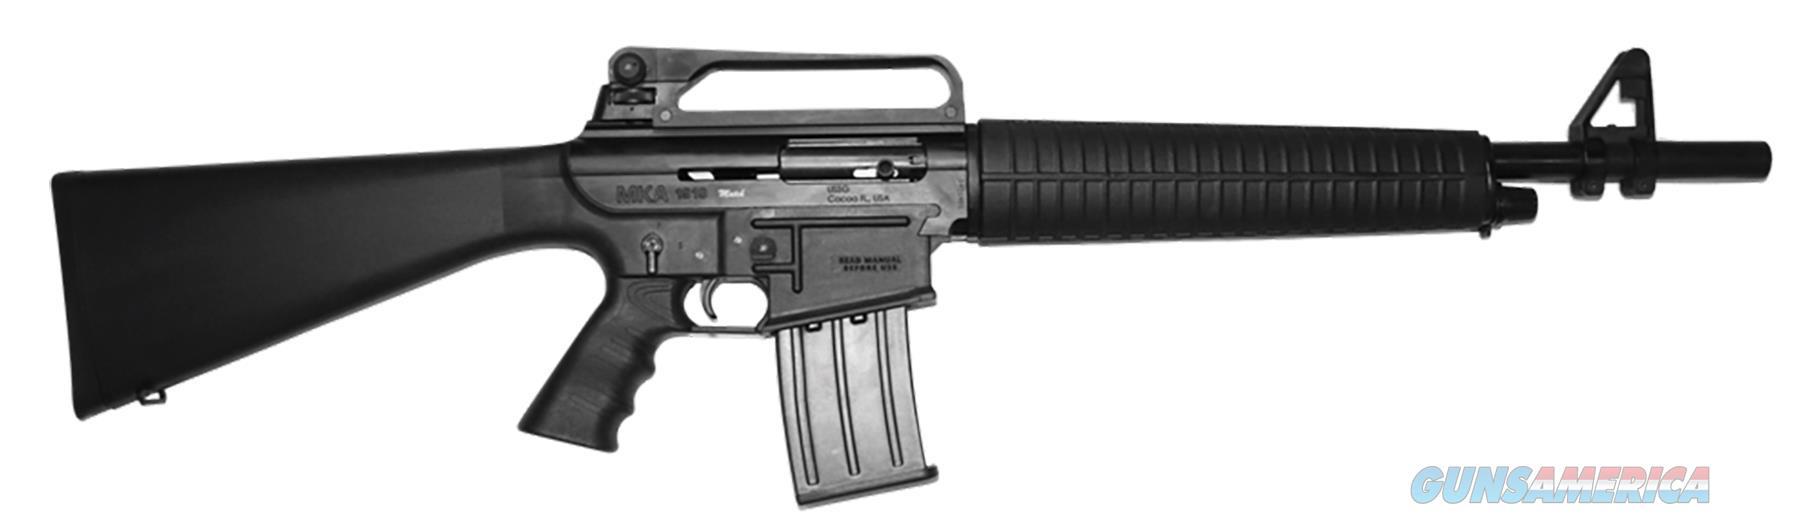 Us Sporting Goods Akdal Mka 1919 12Ga 20 Ar Style 2 5Rd MKA191912GA19INSASG  Guns > Shotguns > E Misc Shotguns